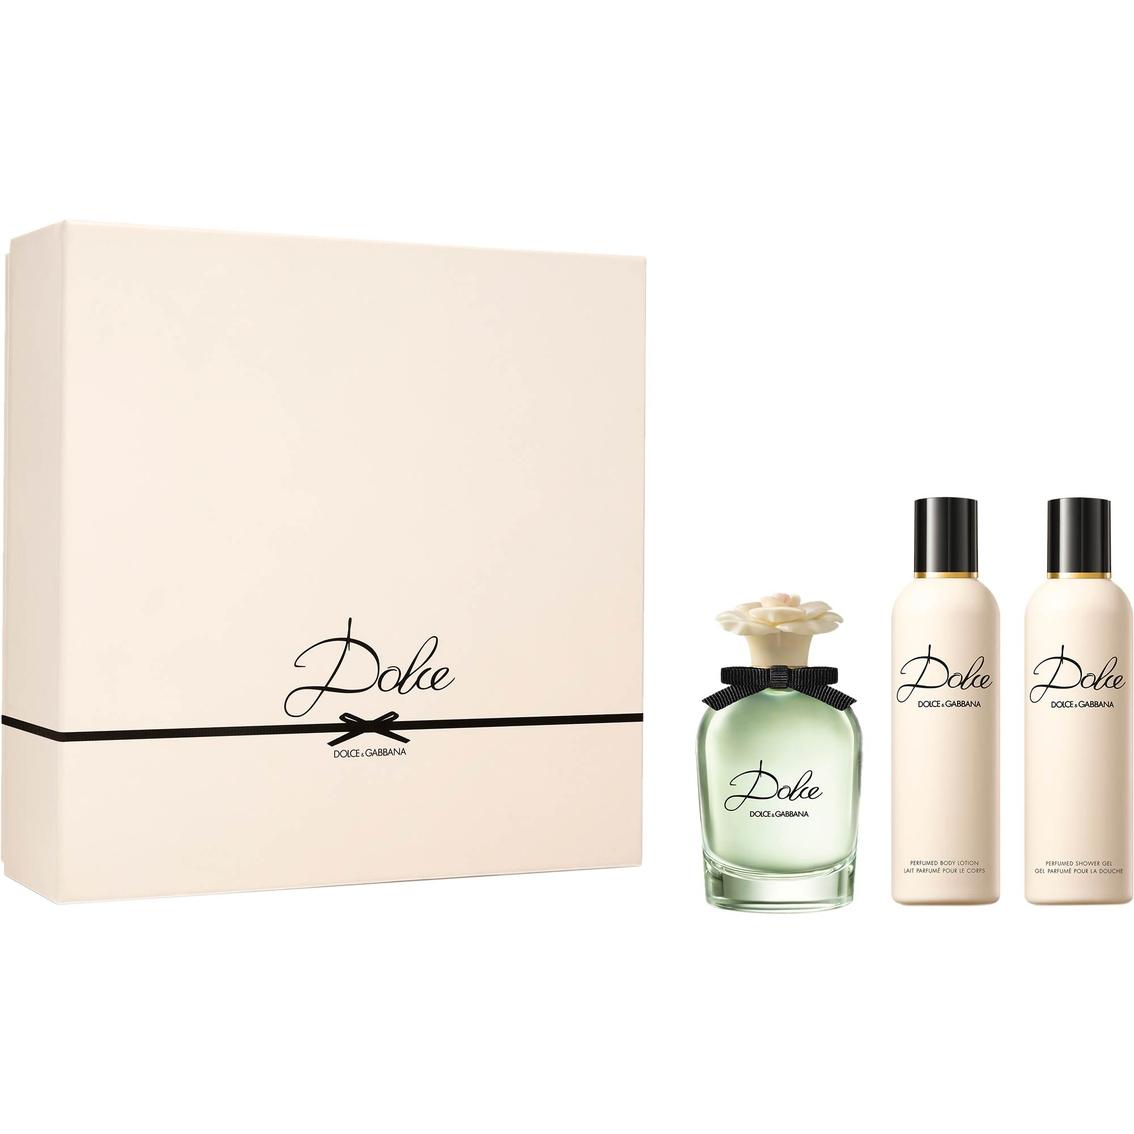 Her Gabbana Dolceamp; SetGifts For Sets Beauty Gift KcuTlFJ31